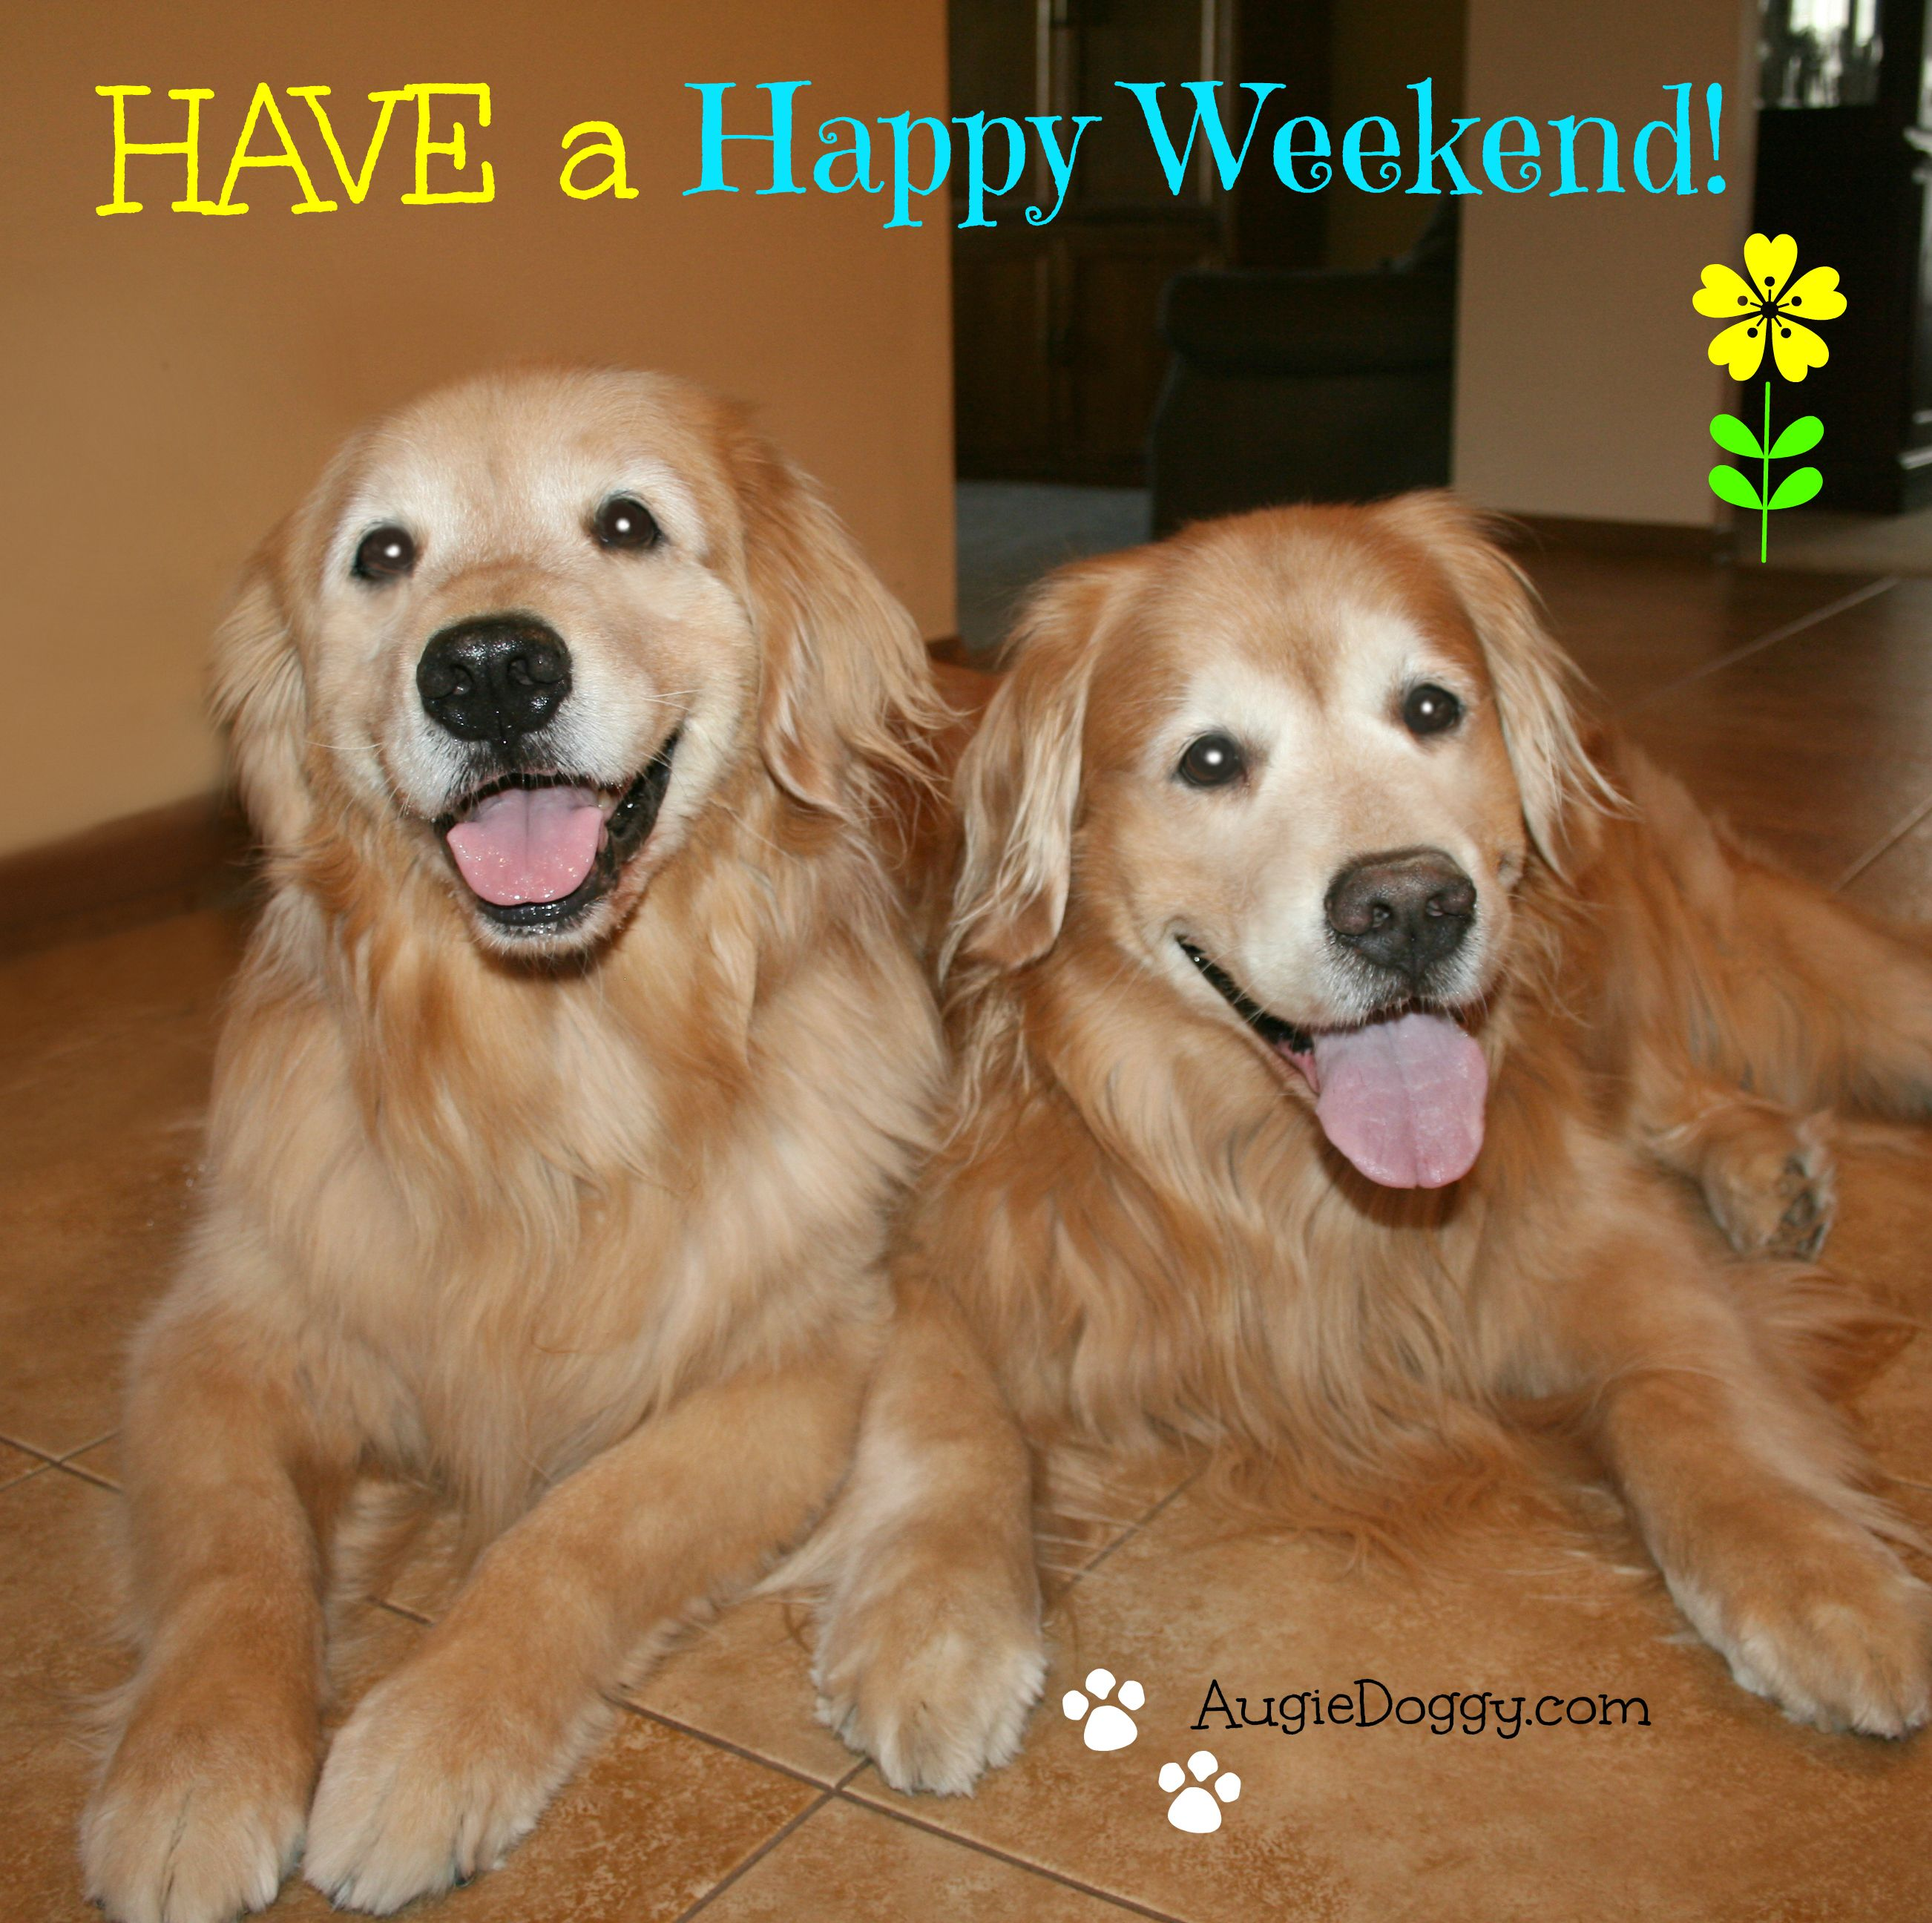 Happy Weekend Dogs Golden Retriever Golden Retriever Pet Holiday